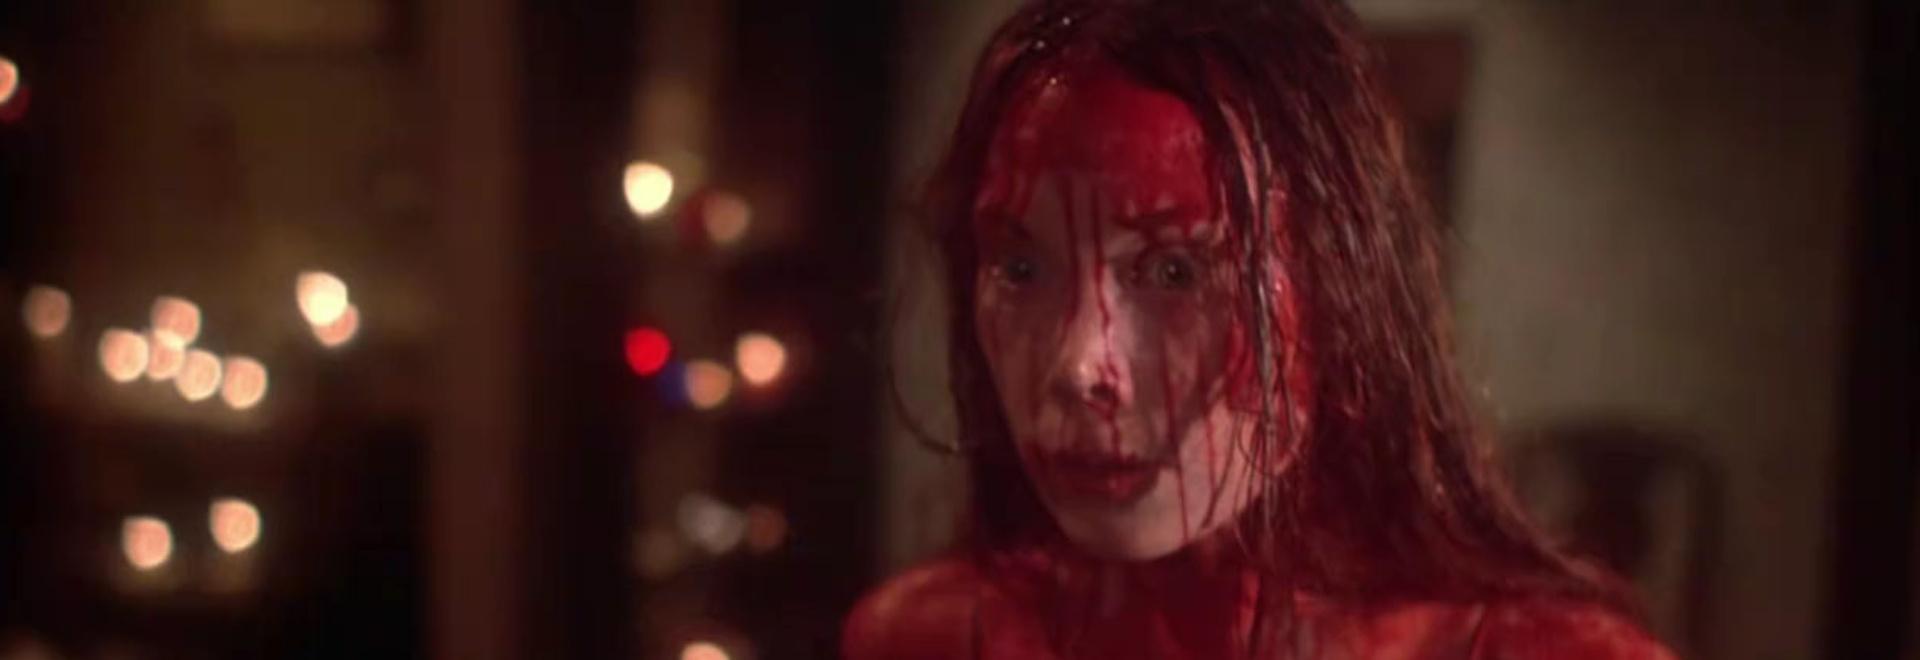 Carrie, lo sguardo di Satana